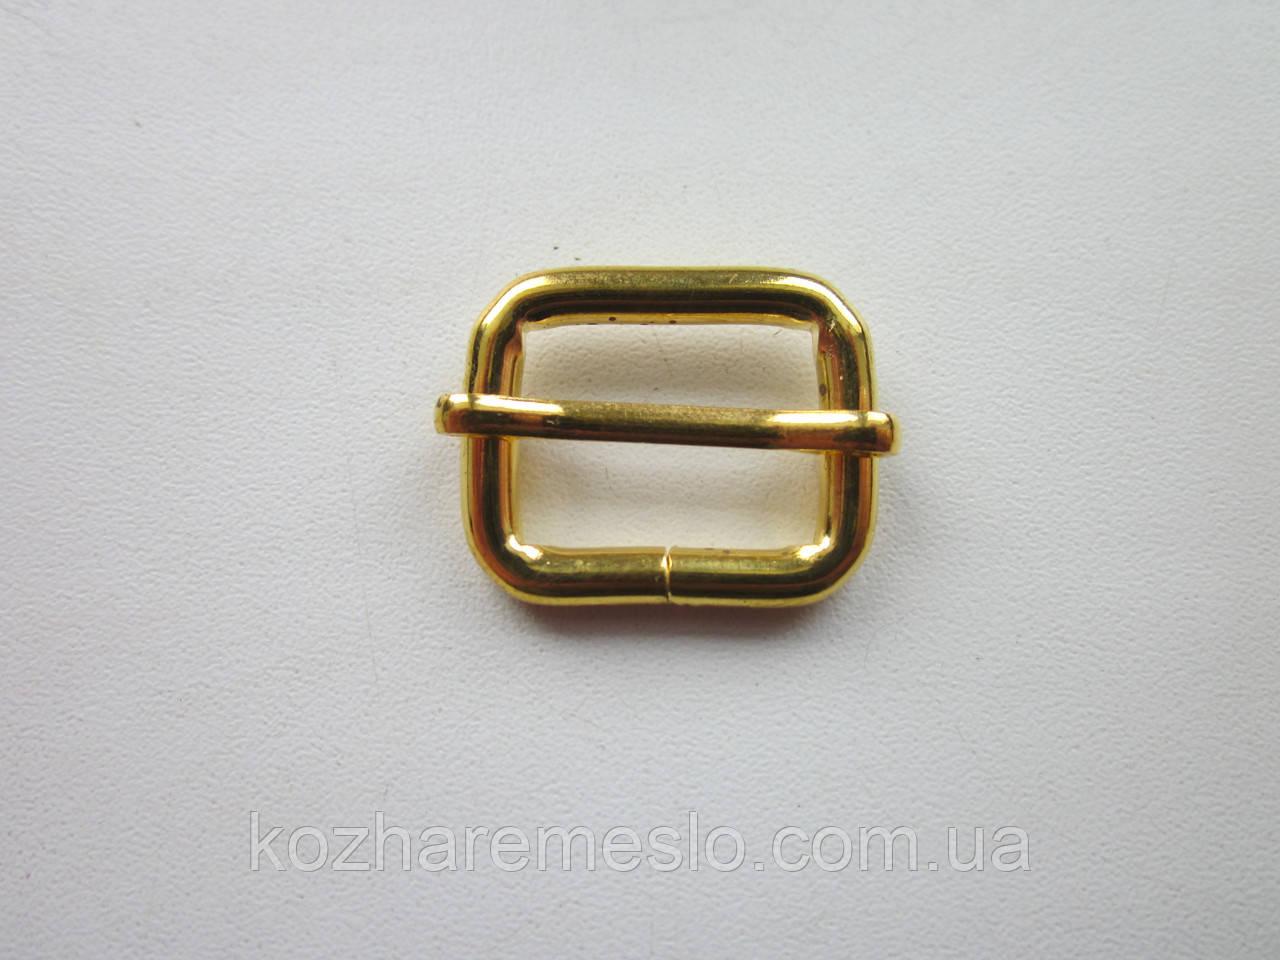 Рамка с перемычкой 4 х 25 х 20 золото